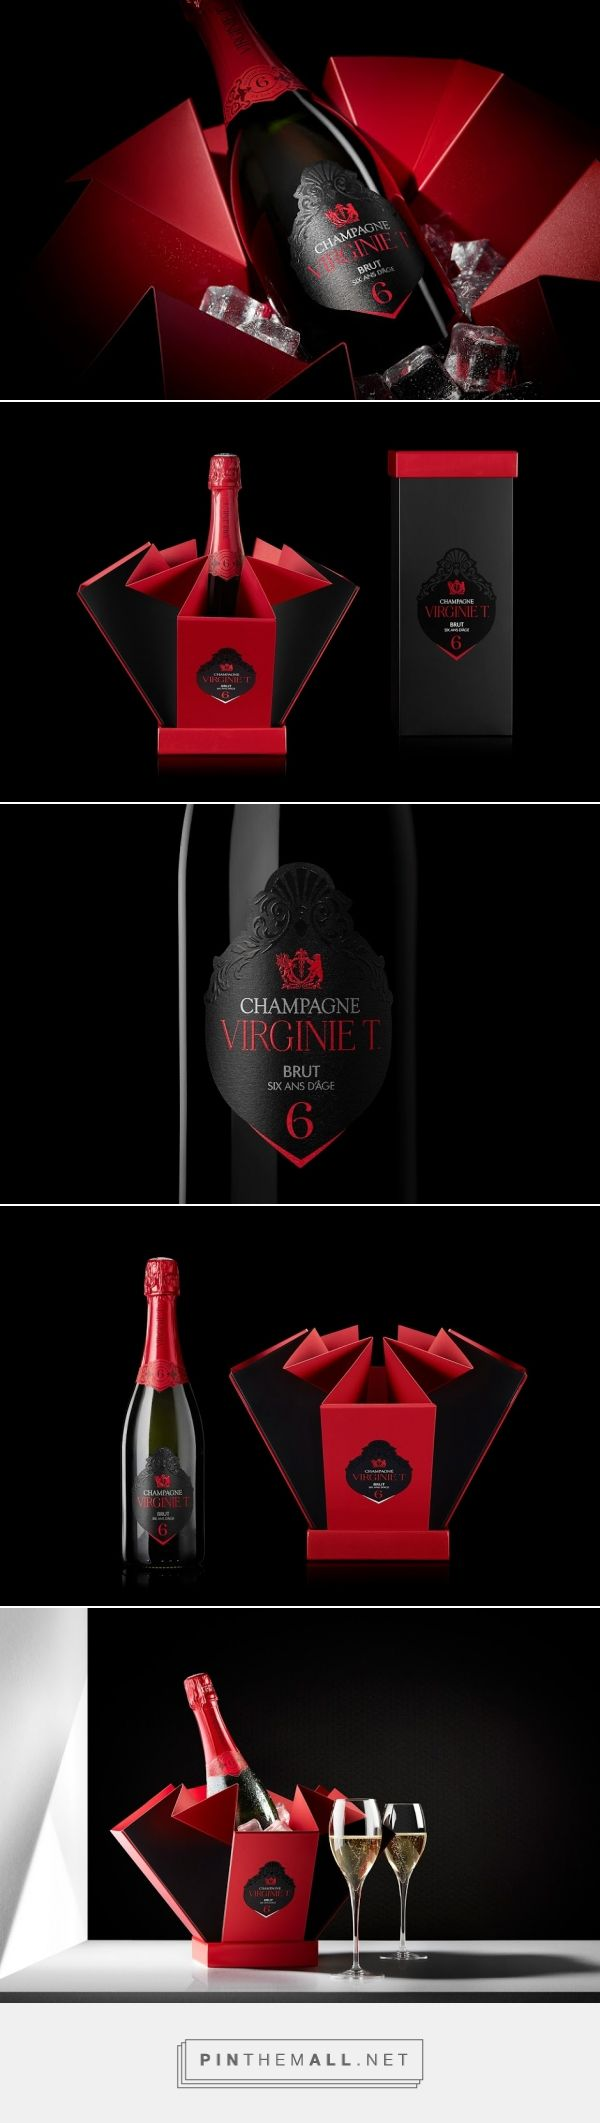 Six Year Old Vintage Virginie T Champagne Bottle Design Packaging Alcohol Packaging Bottle Packaging